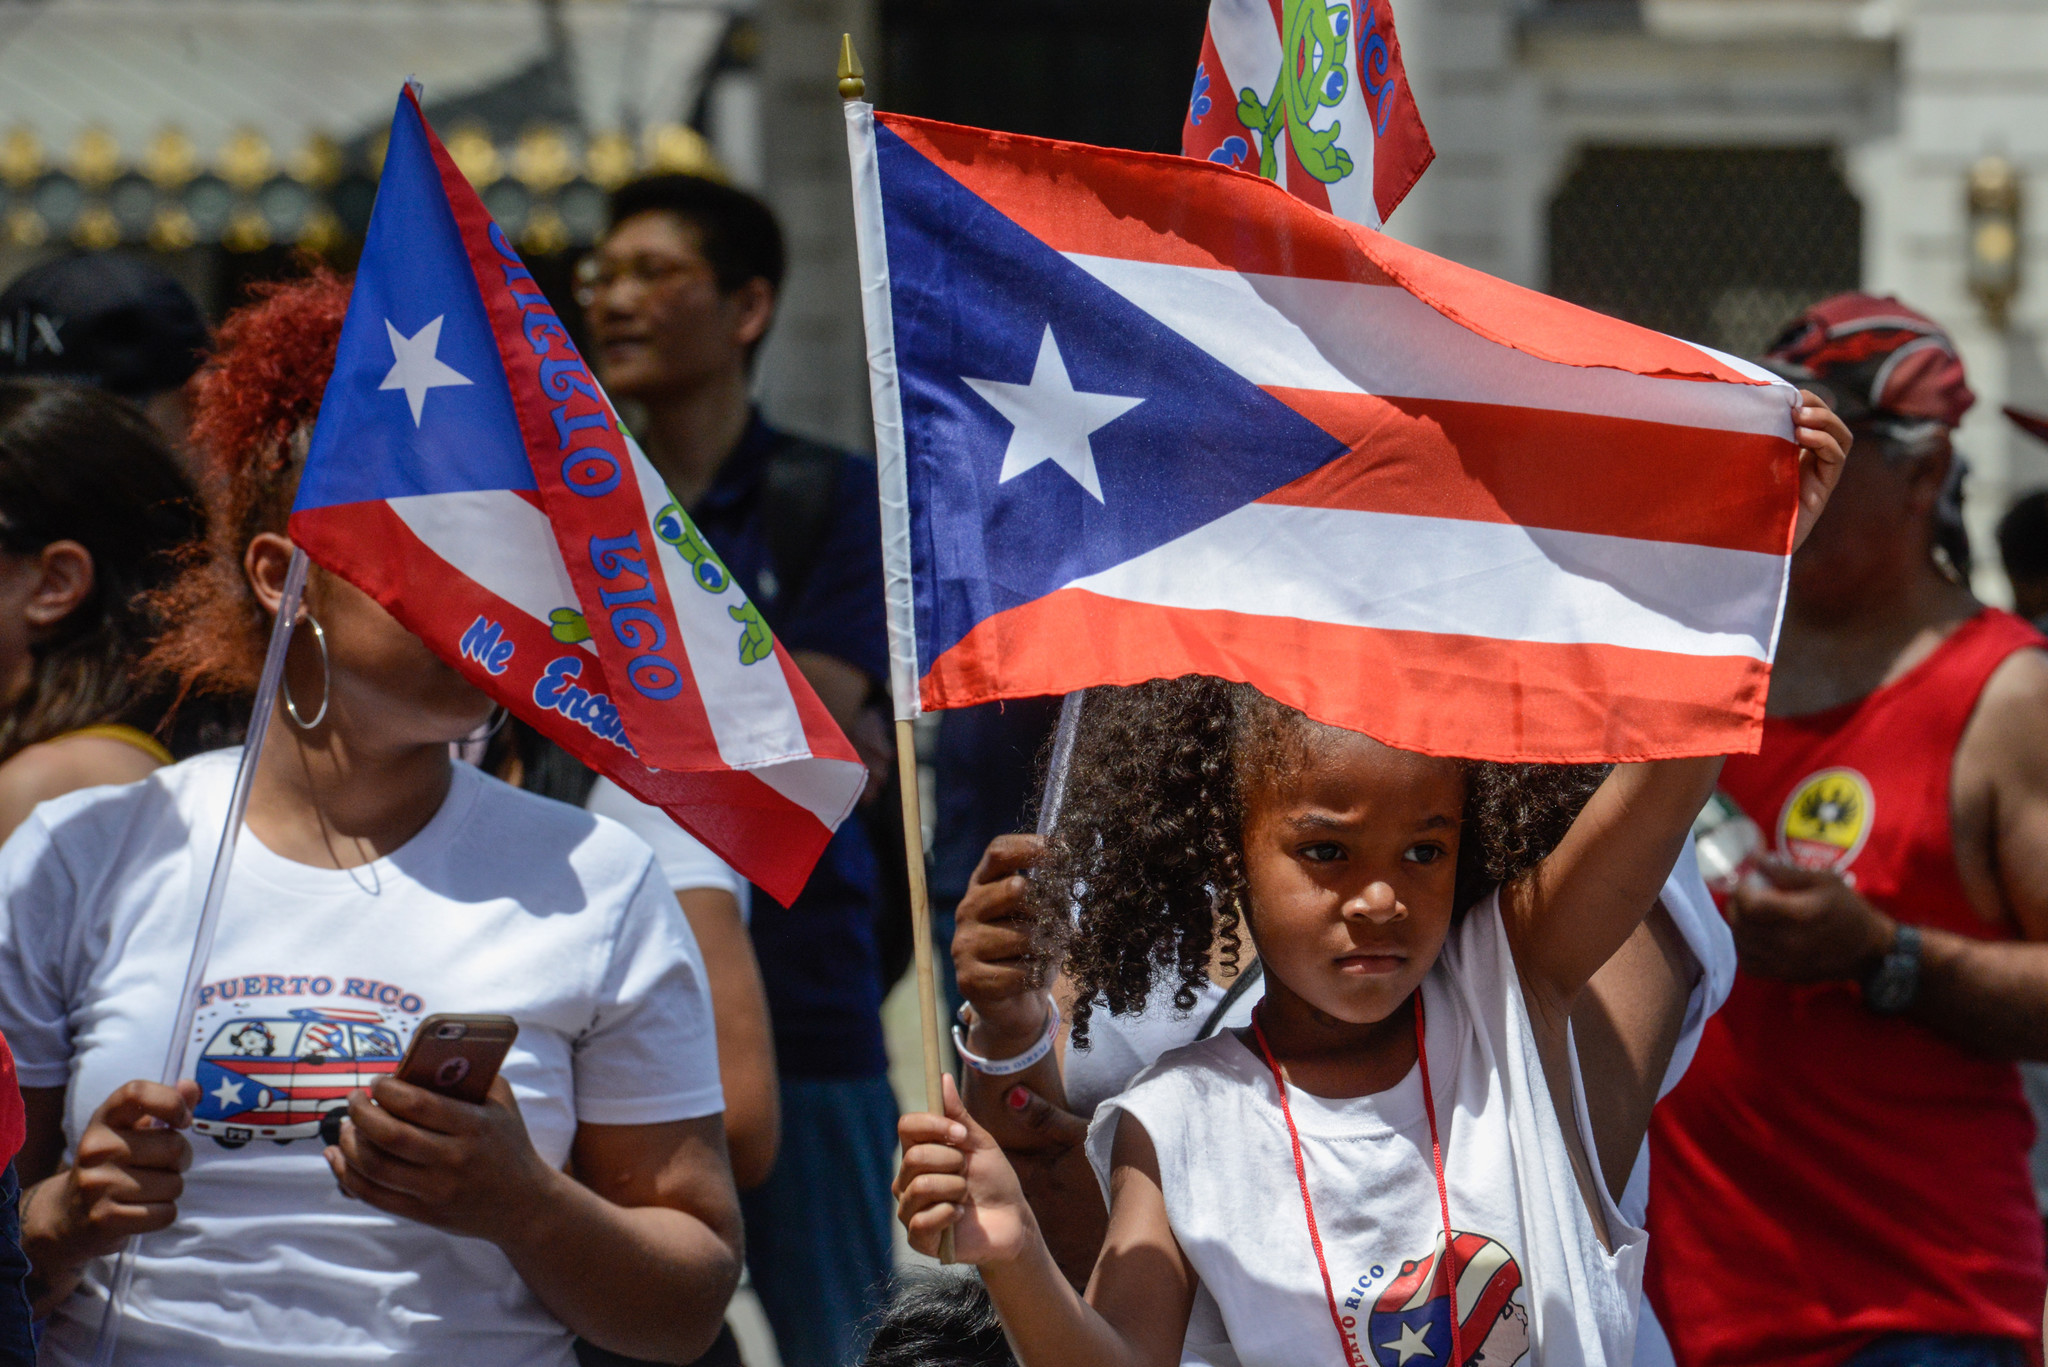 Puerto rican day parade 2017 la times for Puerto rican